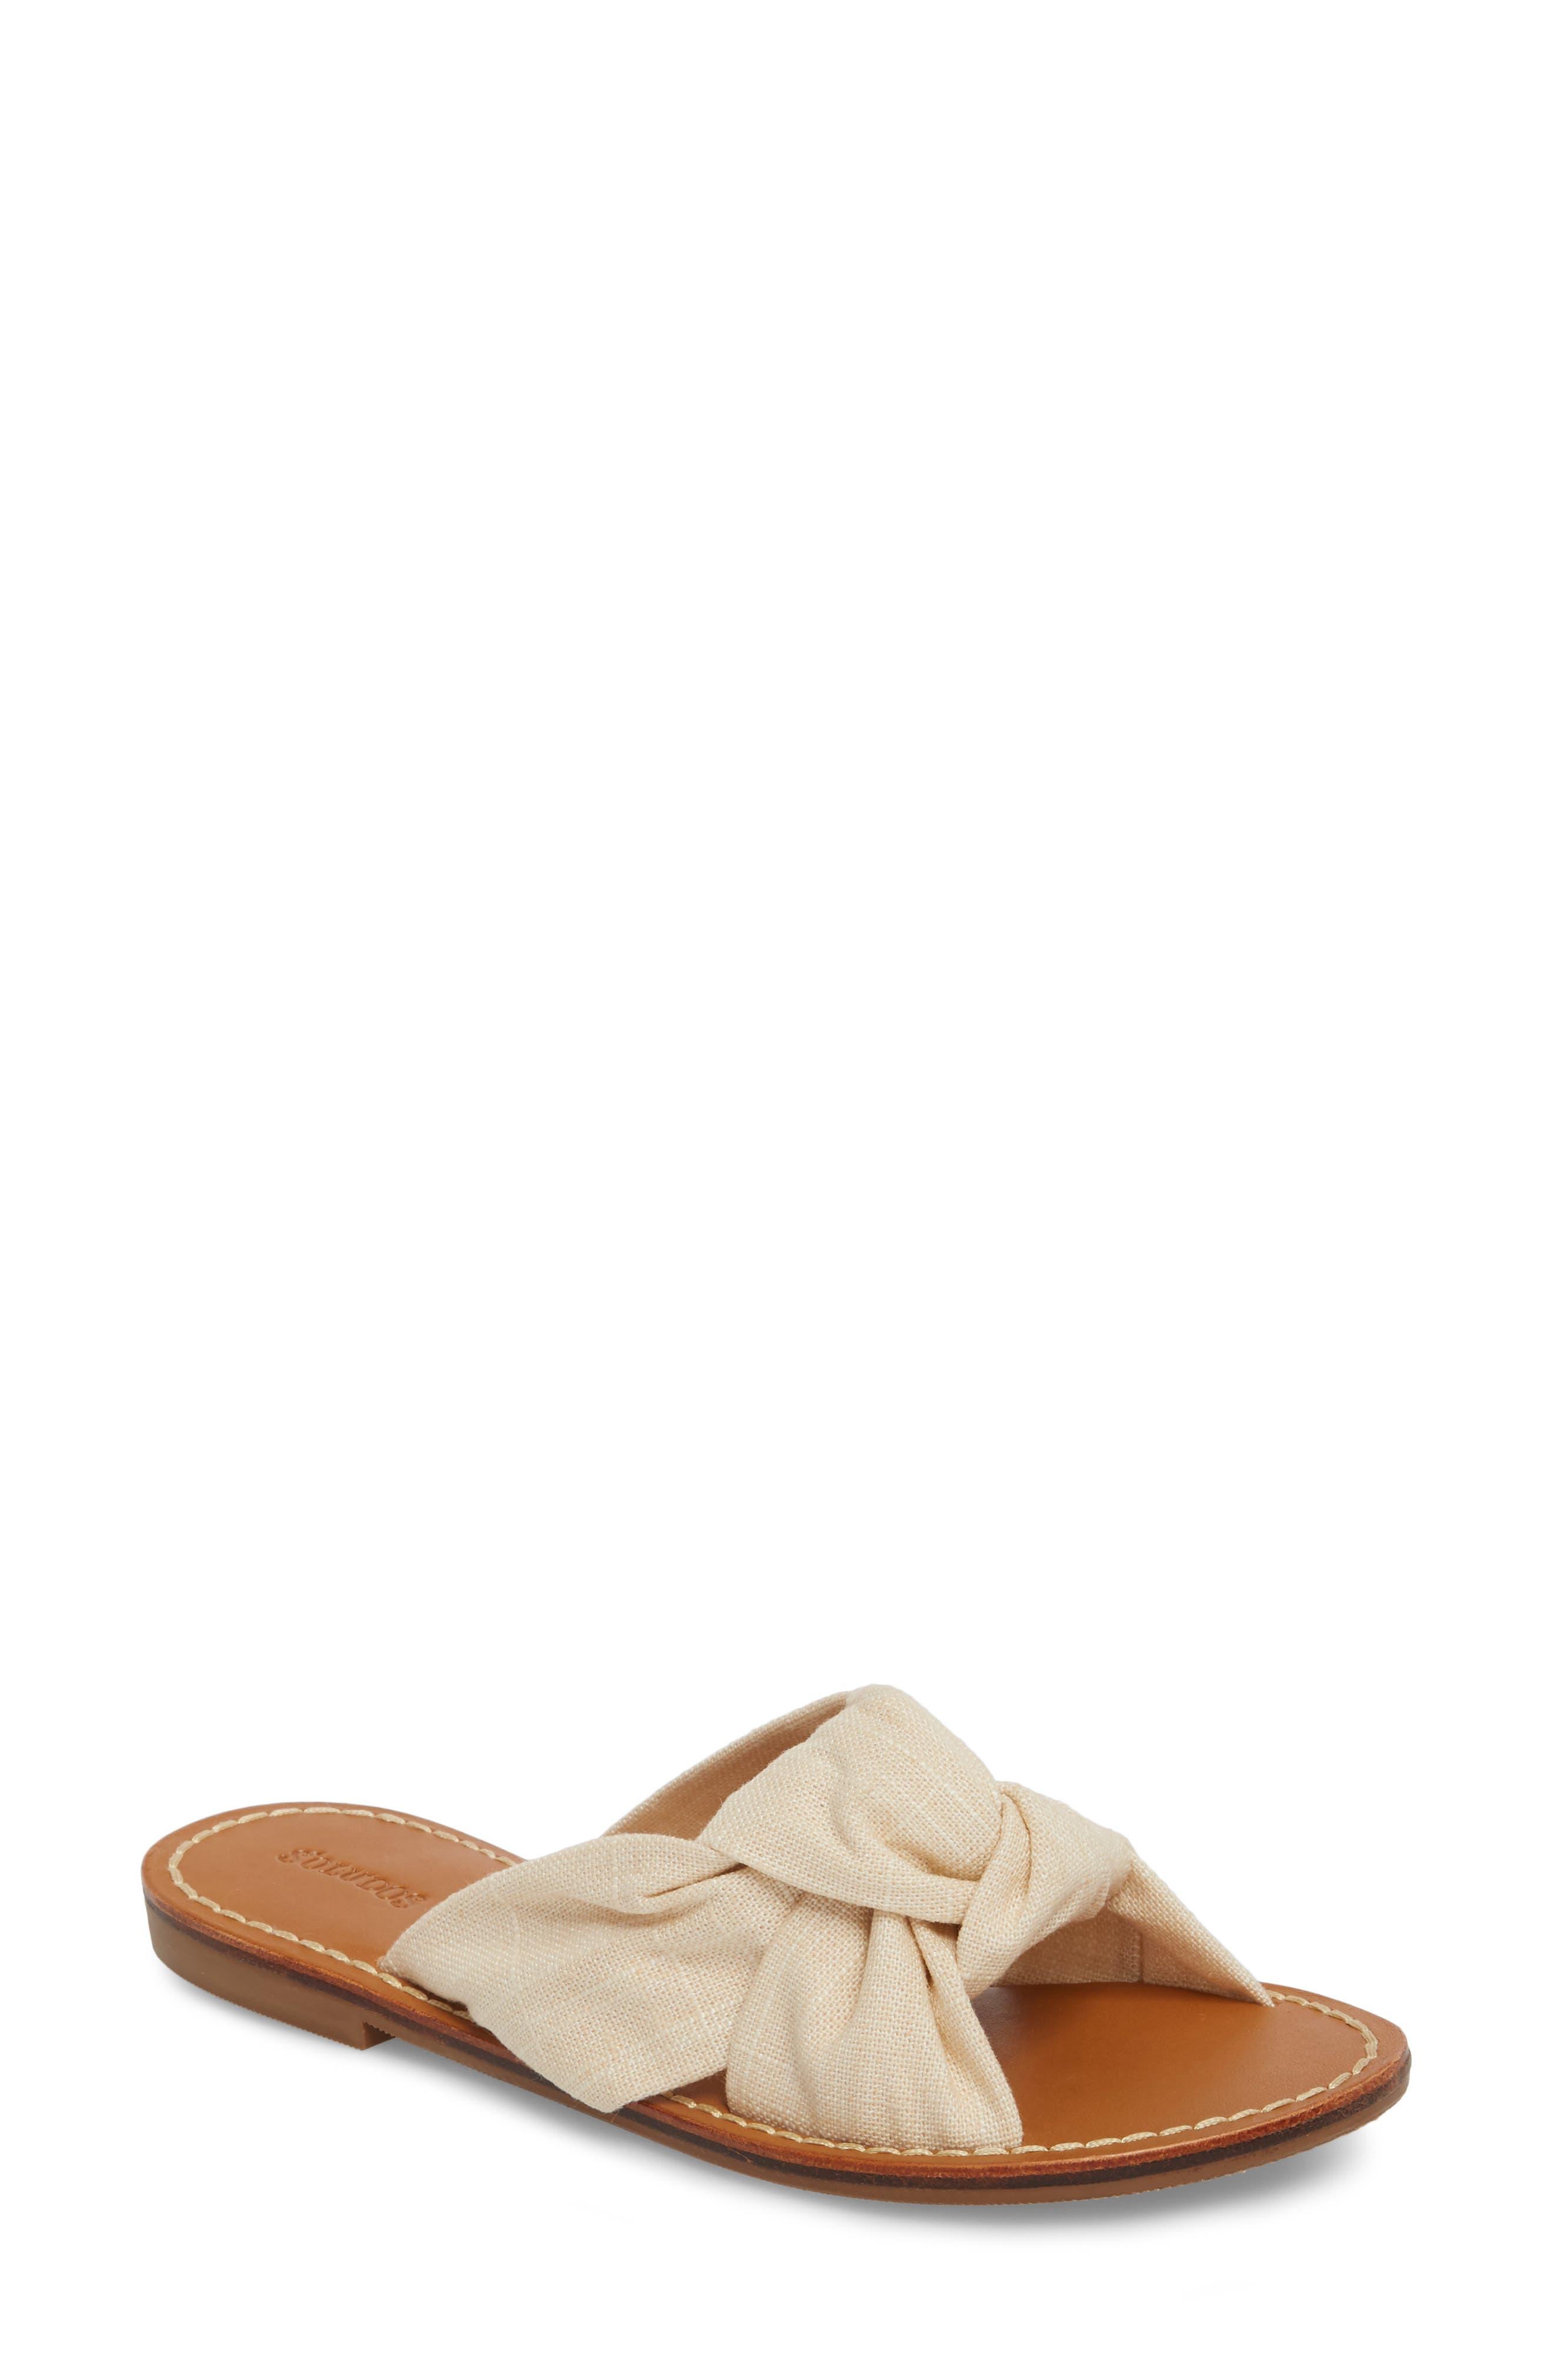 Knotted Slide Sandal,                         Main,                         color, Blush Fabric